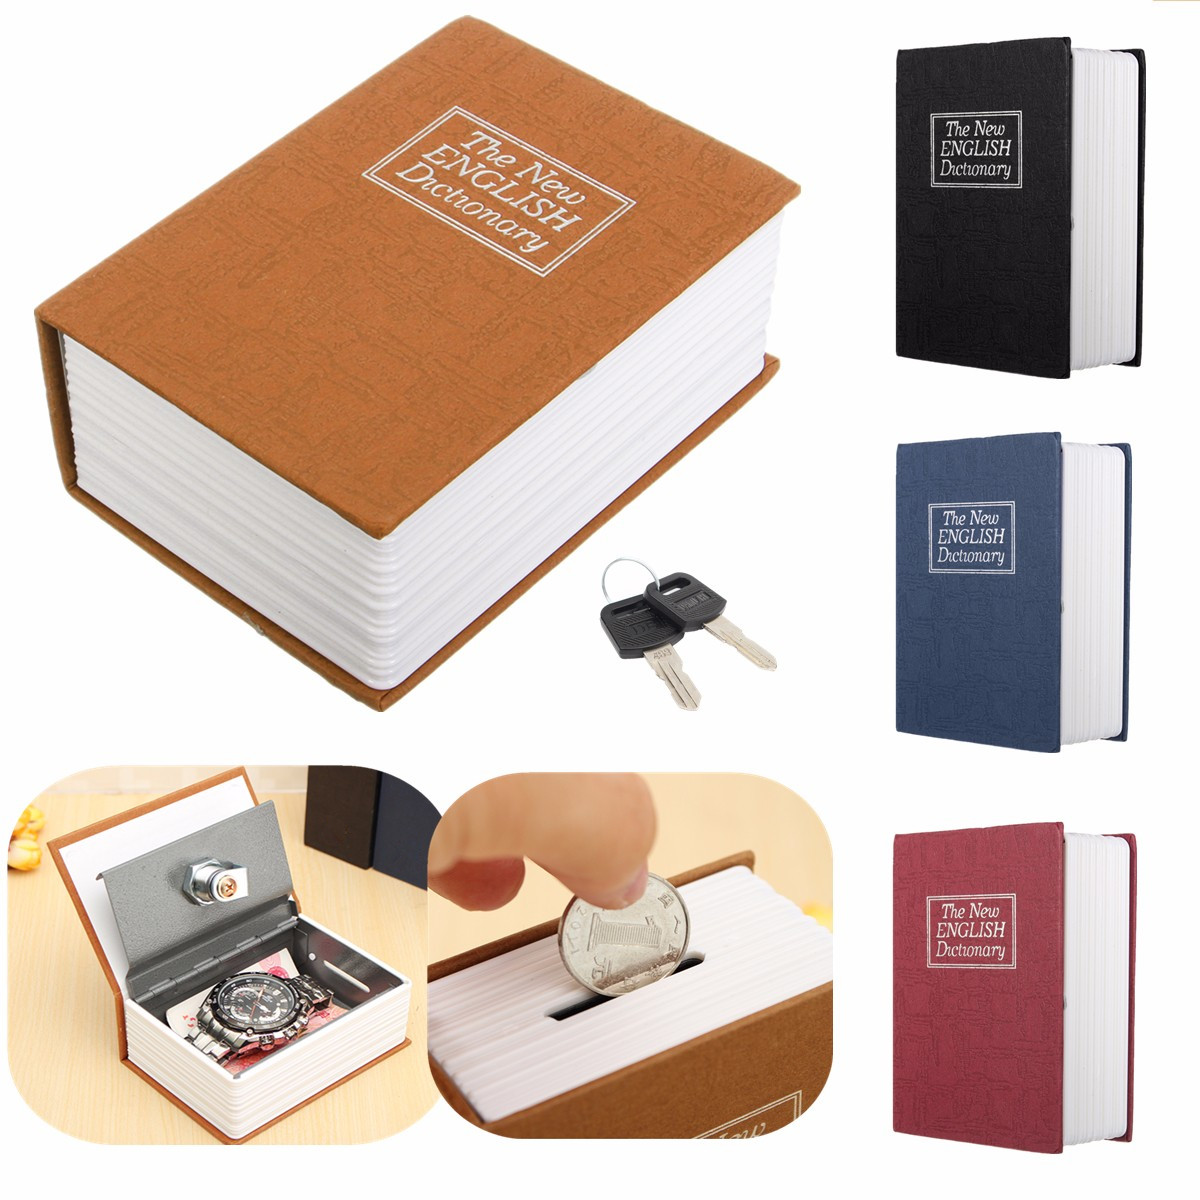 4 Color Home Storage Safe Box Dictionary Book Bank Money Cash Jewellery Hidden Secret Security Locker With Key Lock